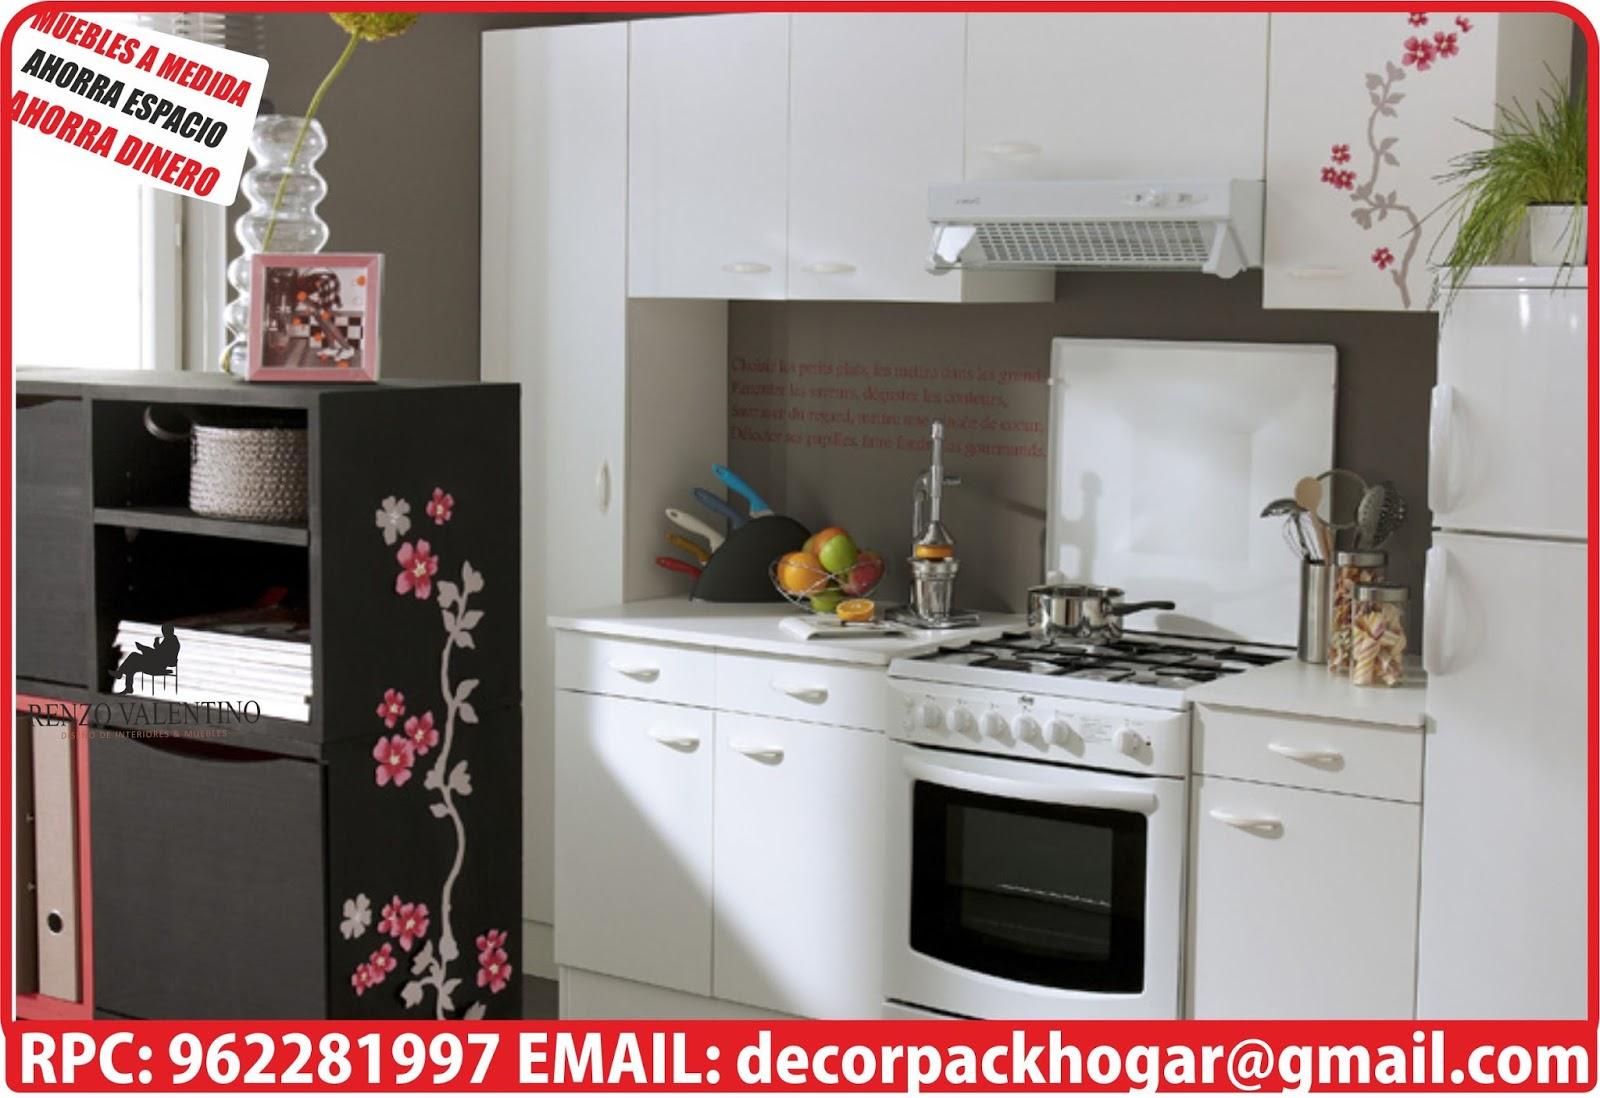 Dise os fabricacion de closet cocina y muebles de oficina for Modelos de muebles de cocina para espacios pequenos